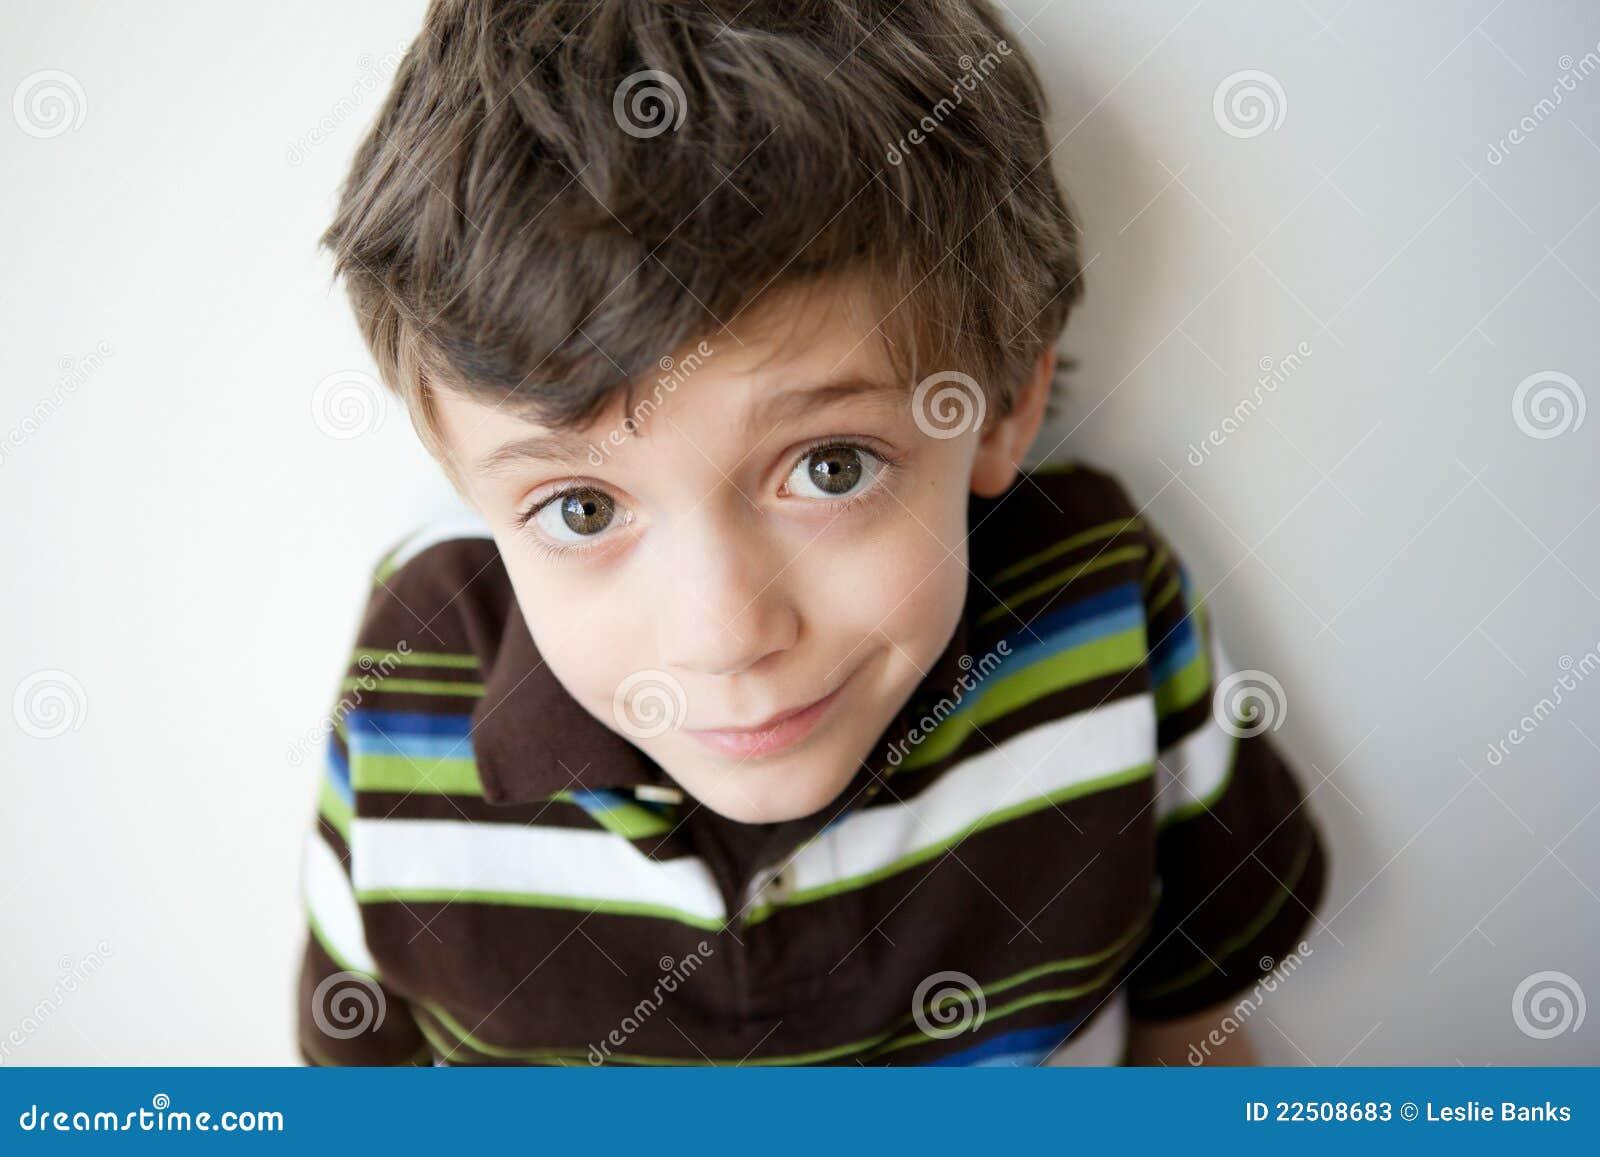 7 Years Old Boy Cute   www.imgkid.com - The Image Kid Has It!